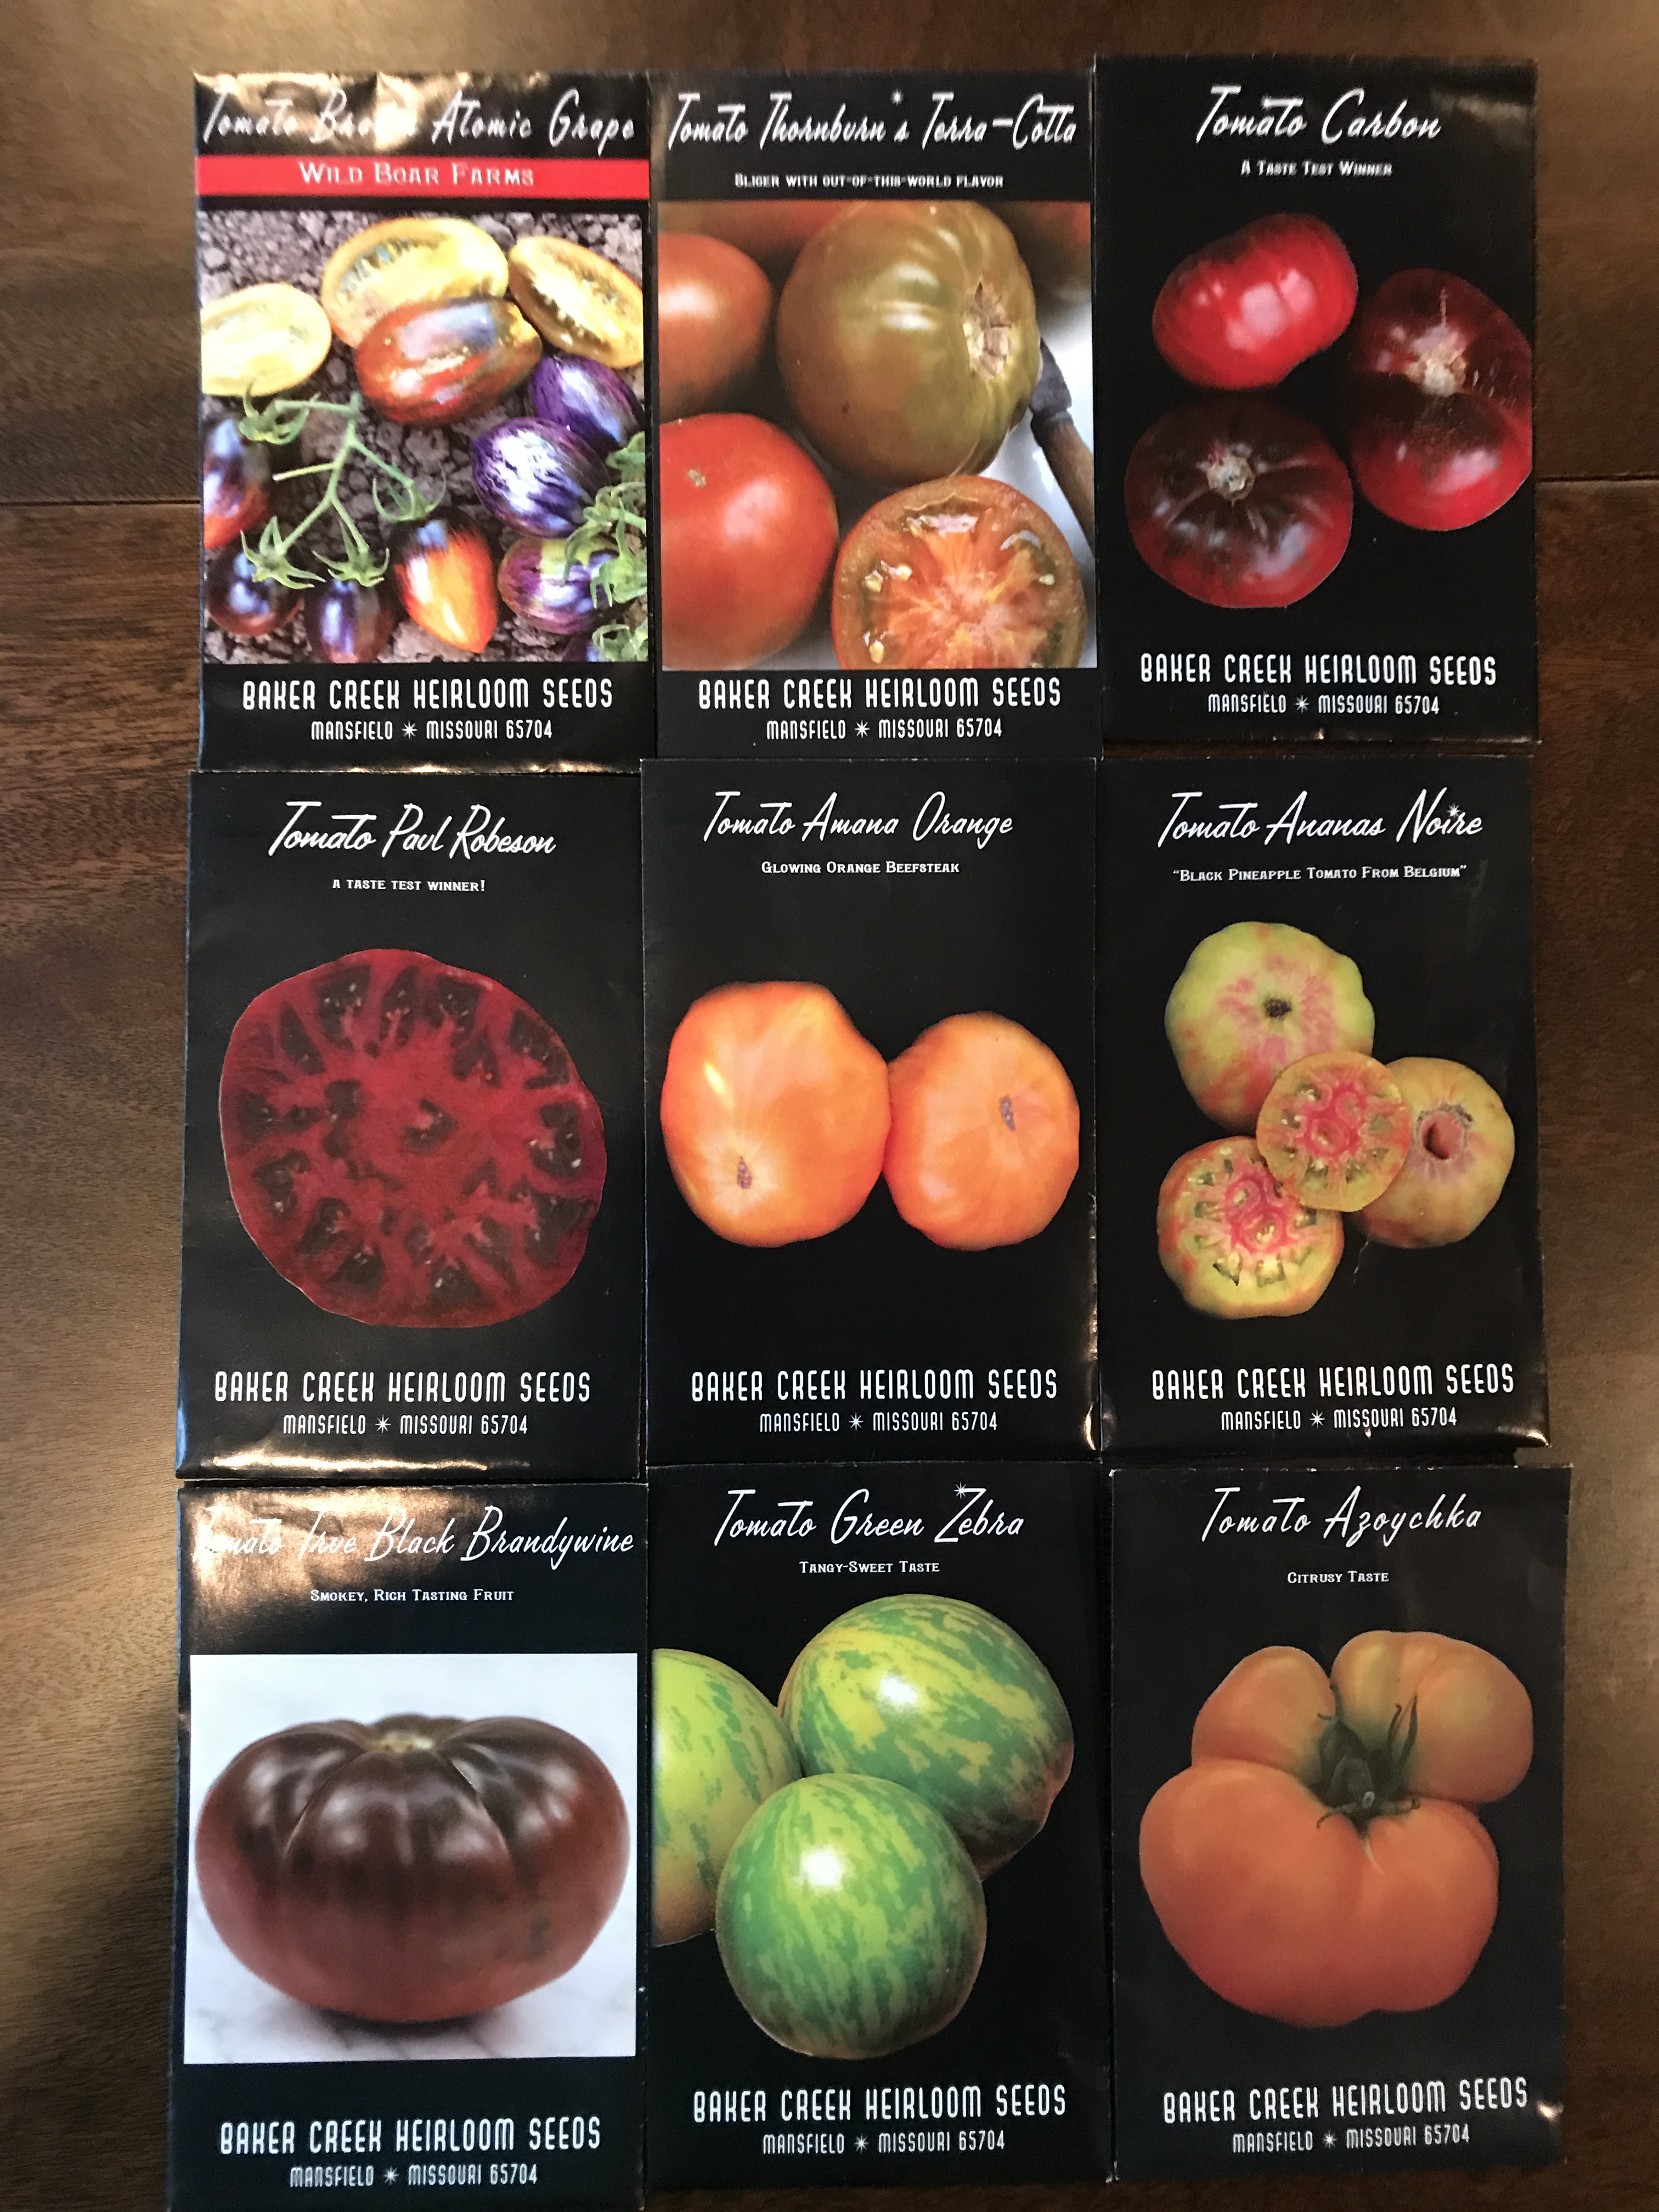 tomato types poster.JPG